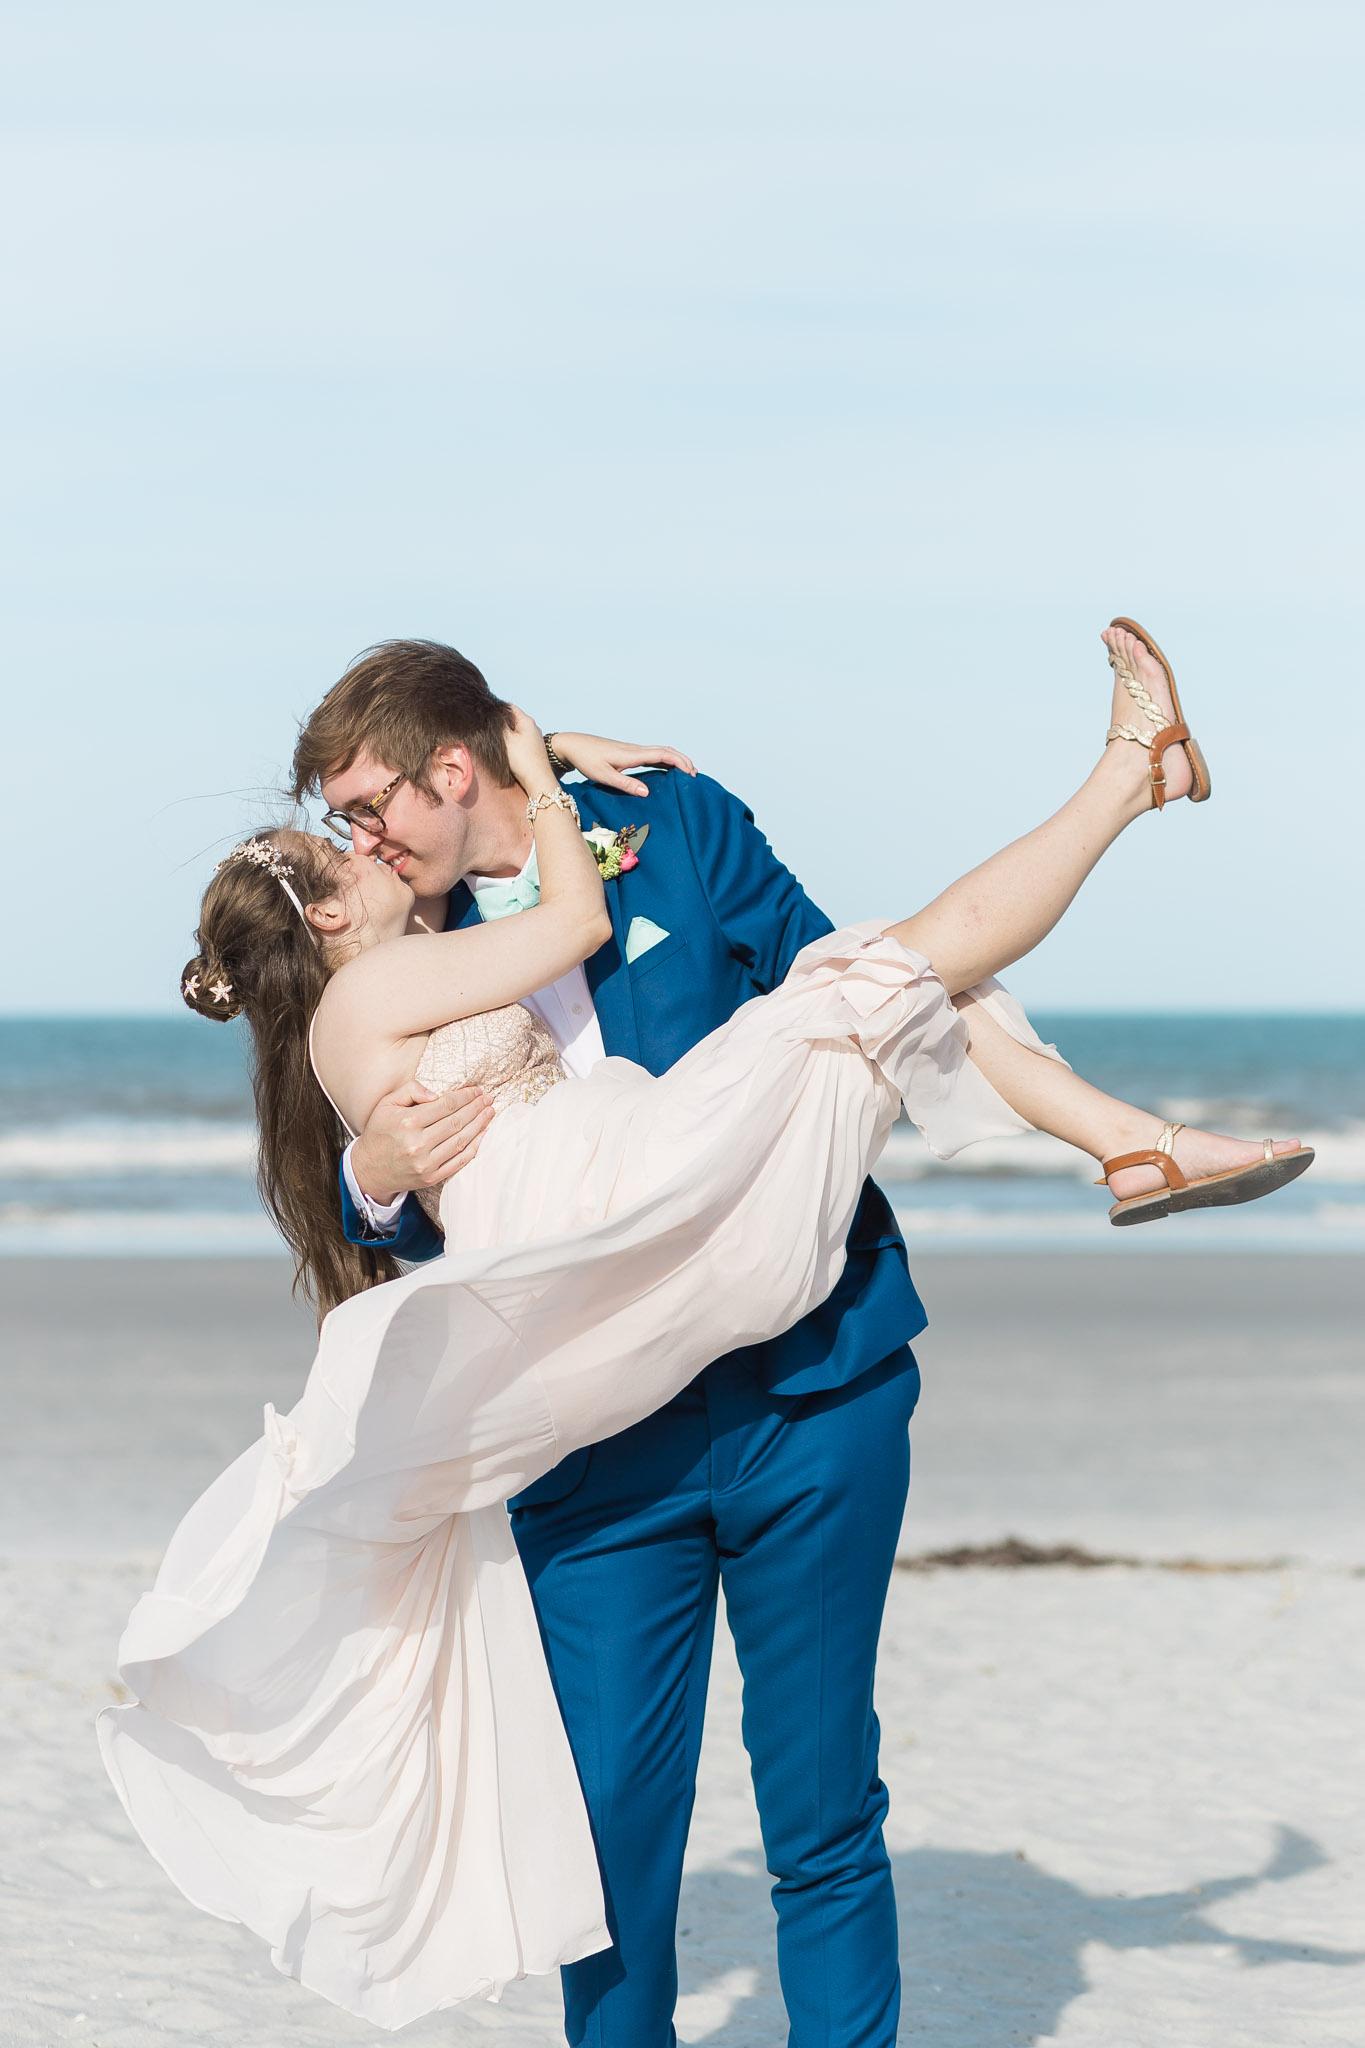 wedding photographer neptune beach.jpg